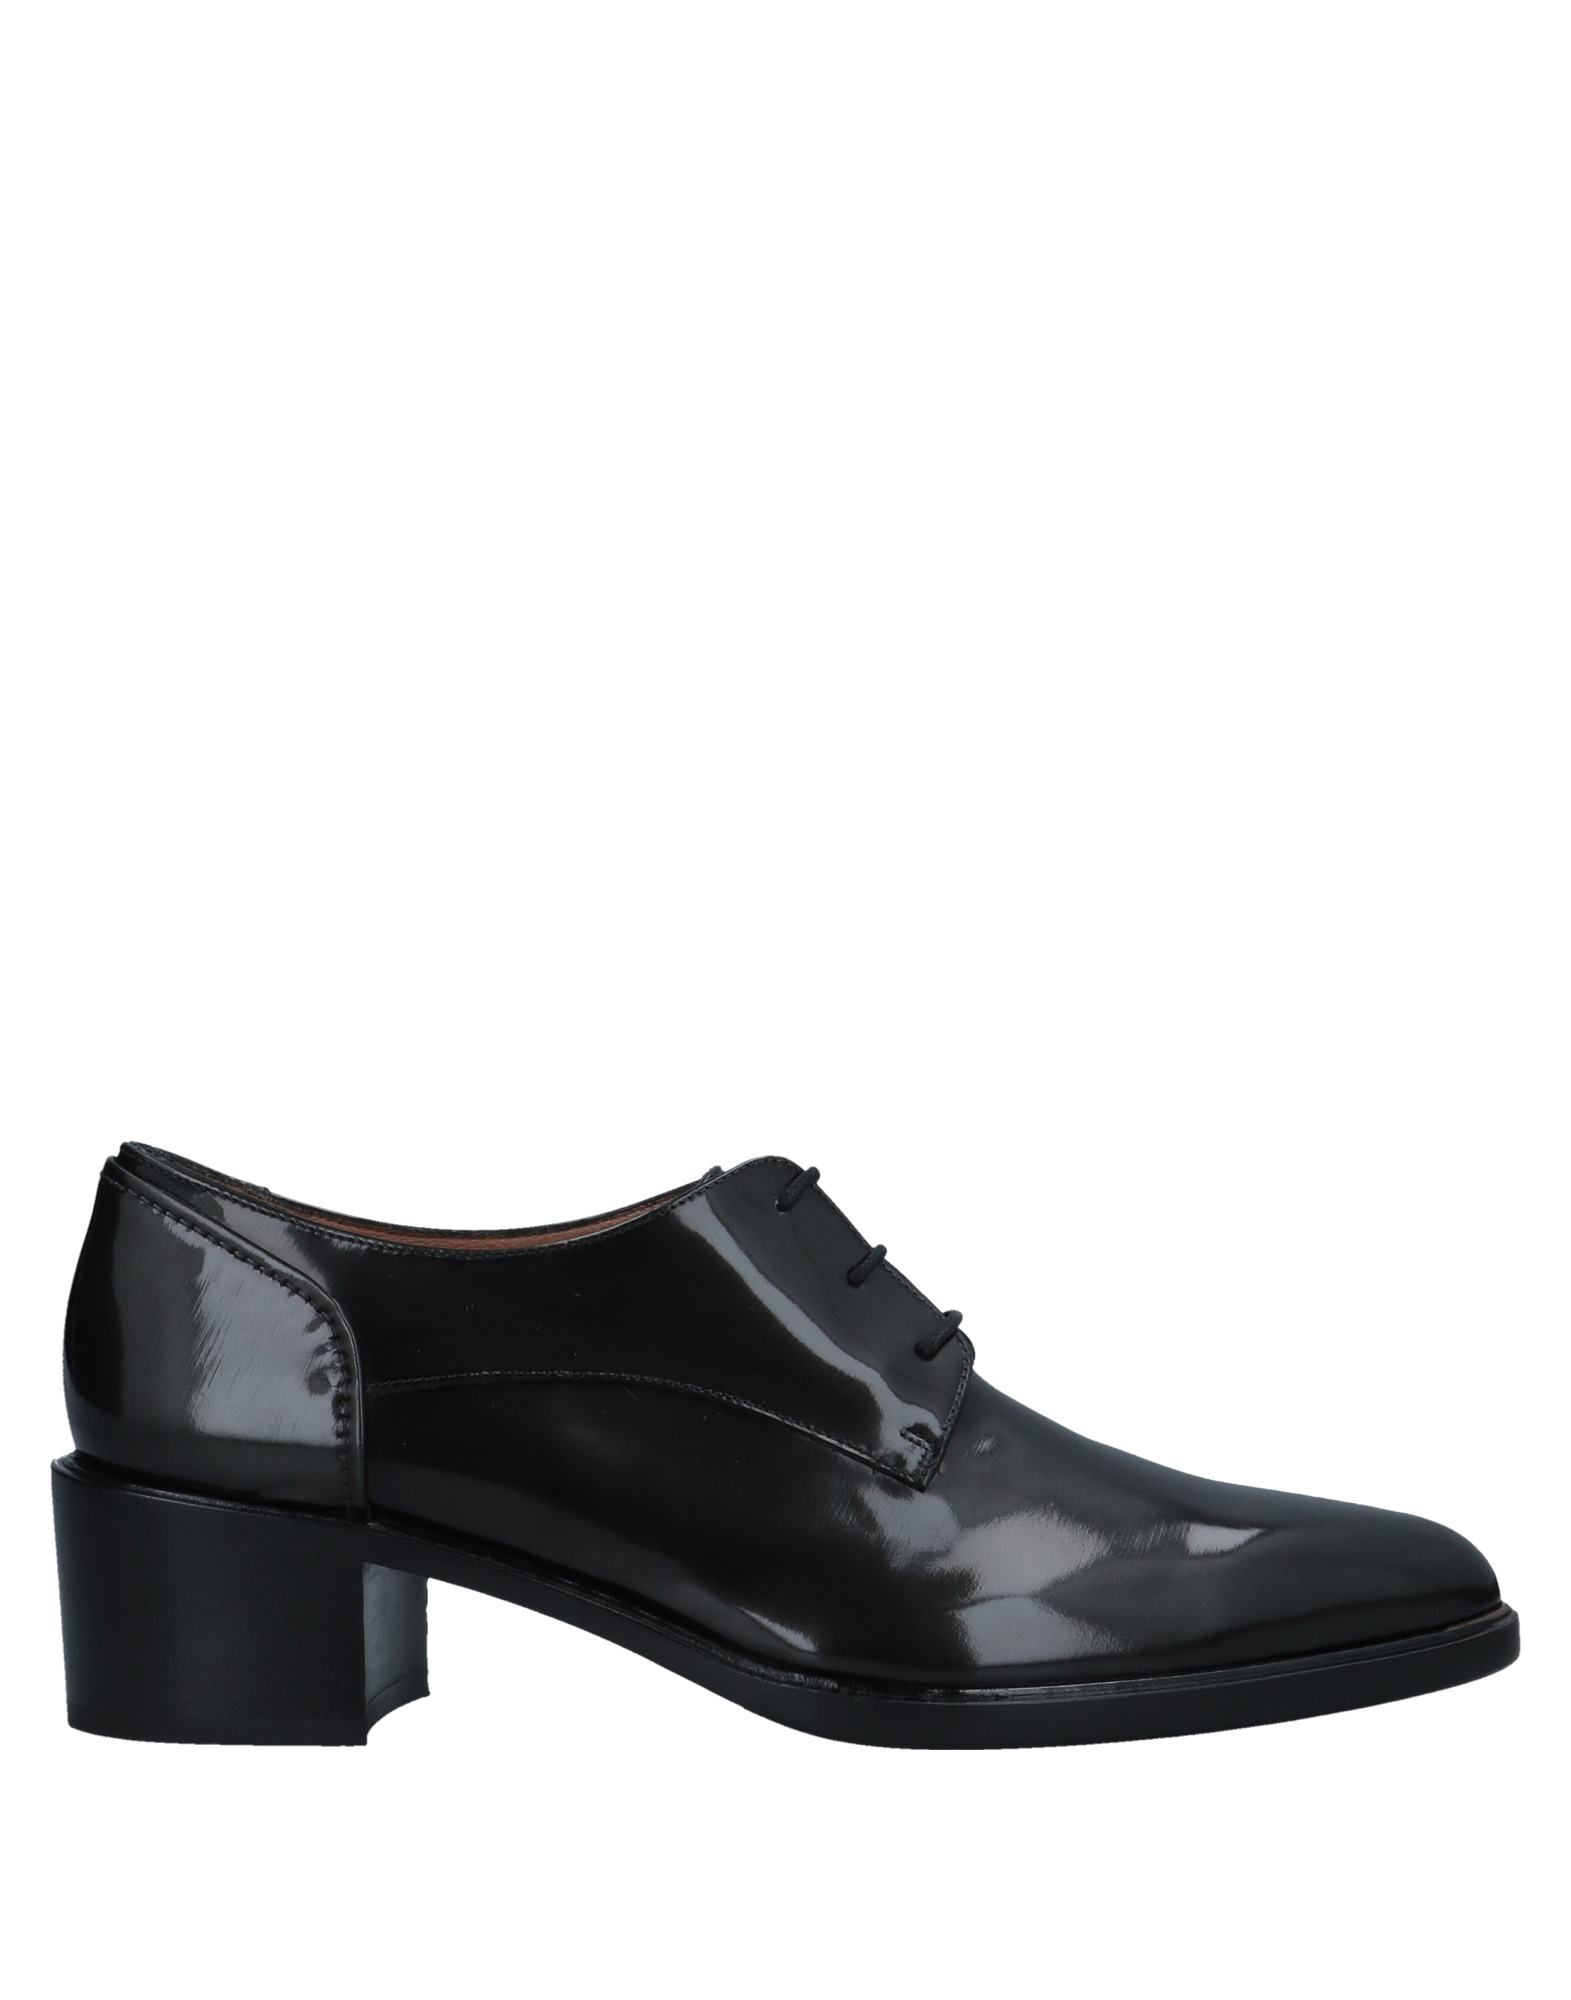 Rabatt Schuhe Fratelli 11548323BC Rossetti Schnürschuhe Damen  11548323BC Fratelli f79db1